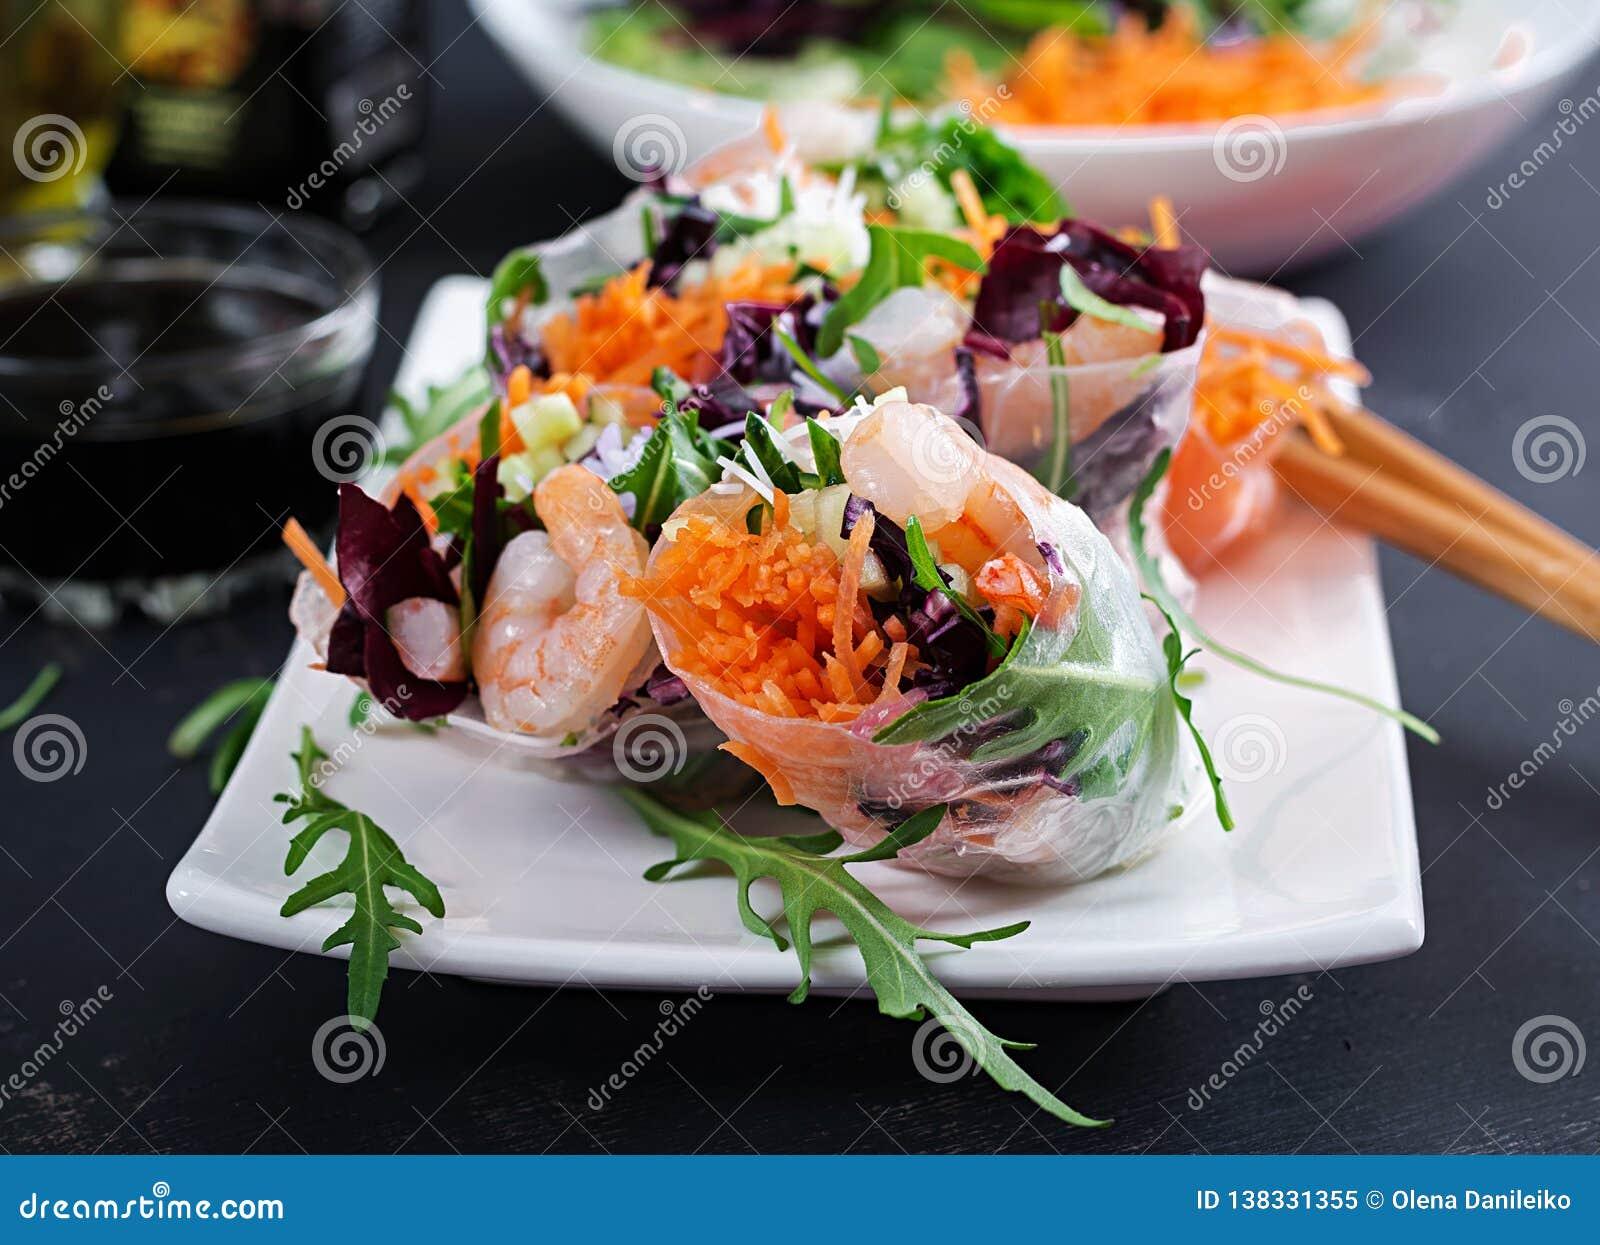 Vegetarian vietnamese spring rolls with spicy shrimps, prawns, carrot